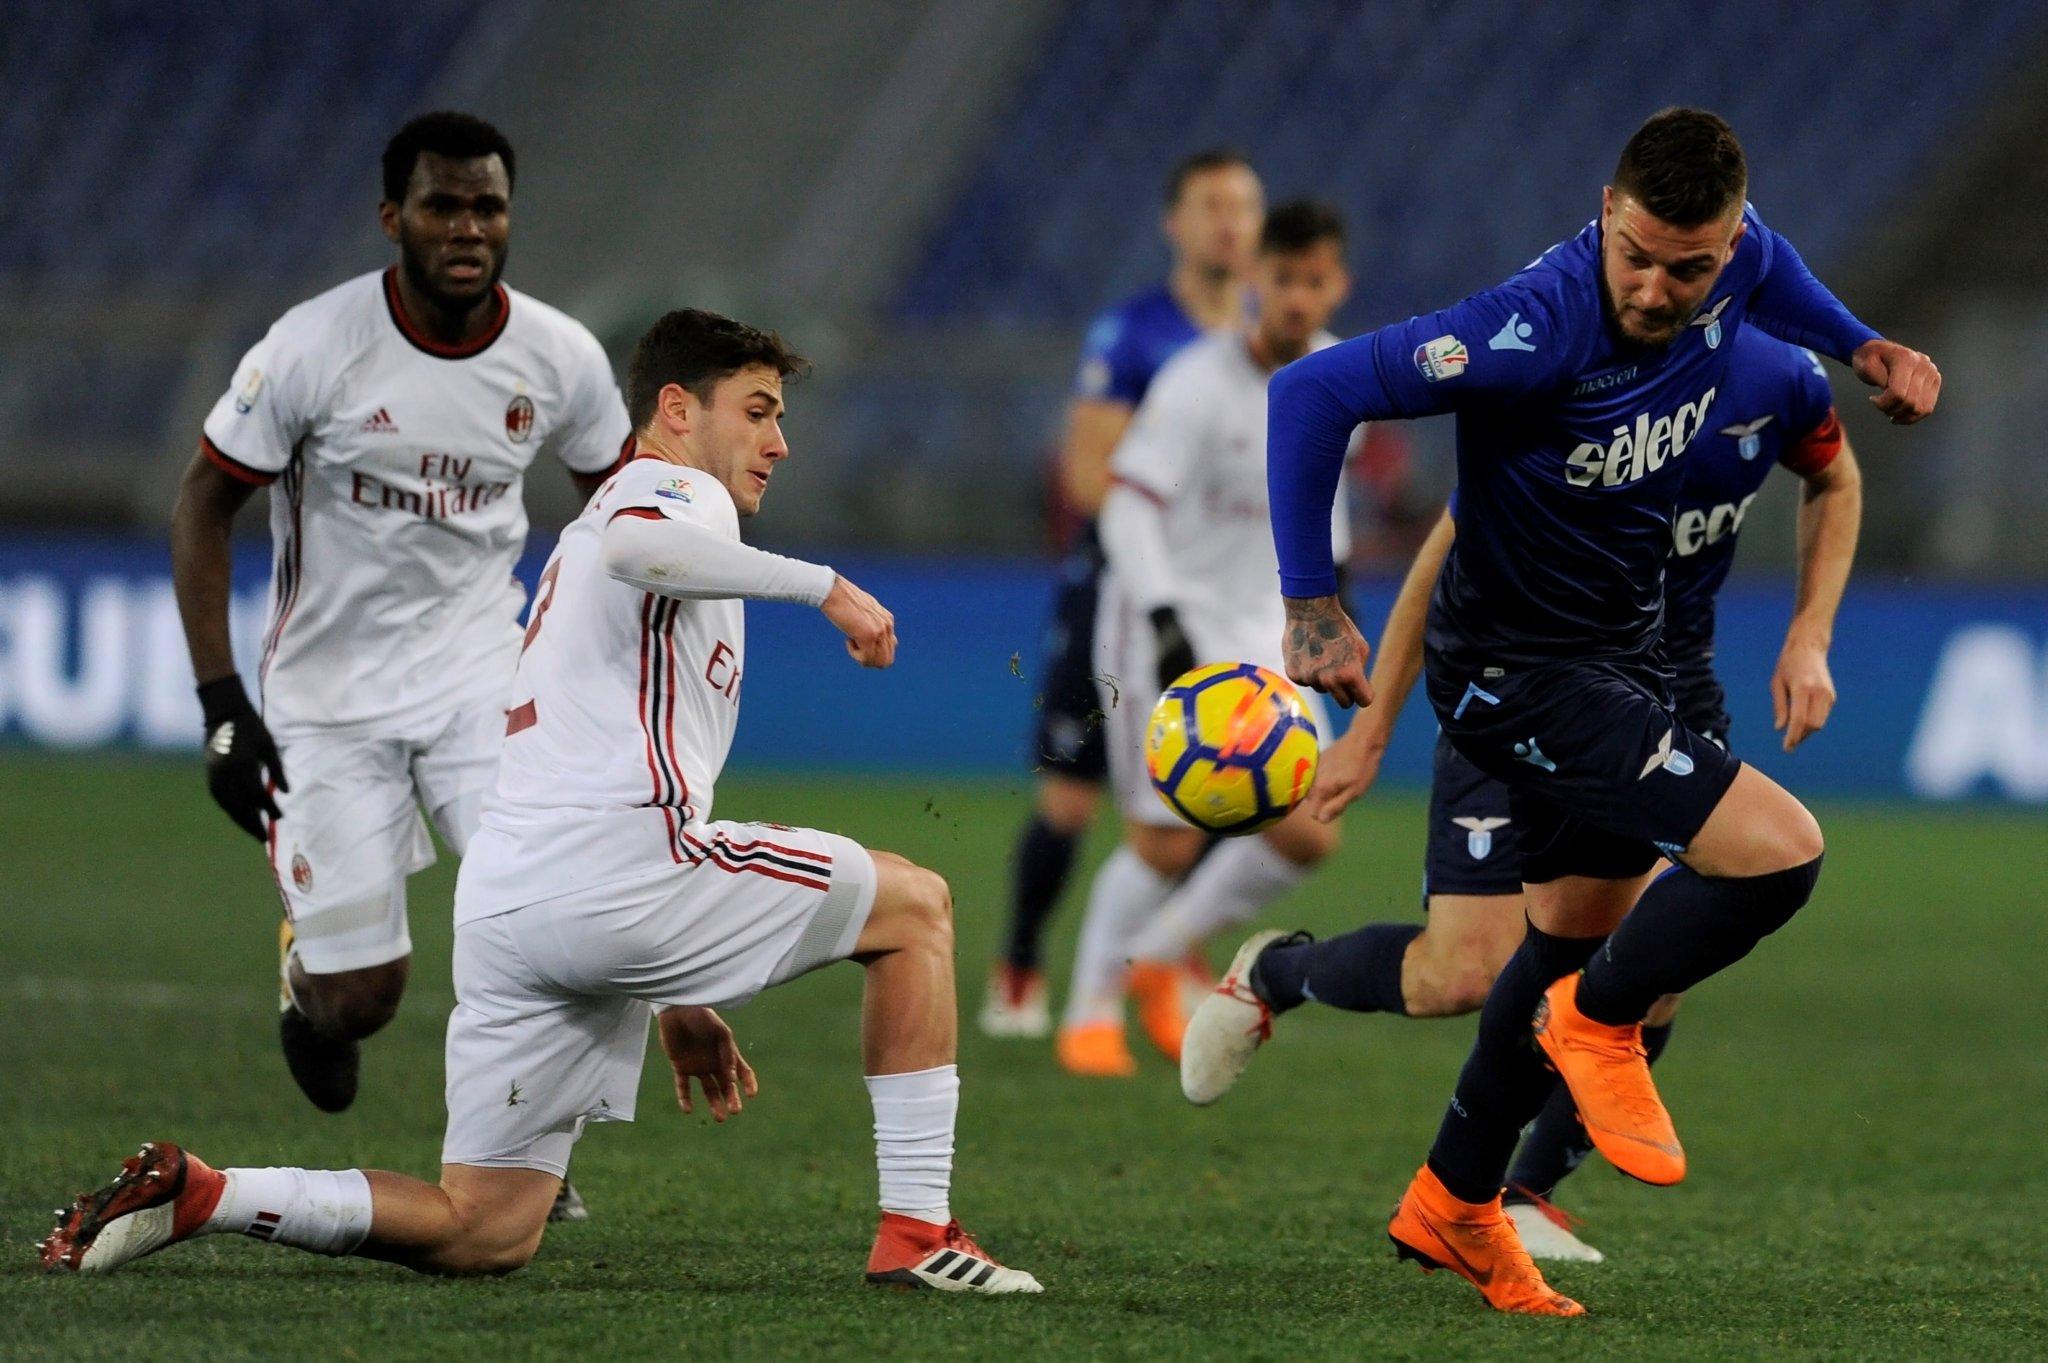 SS Lazio vs AC Milan Highlights & Goals - Coppa Italia - 28 February 2018